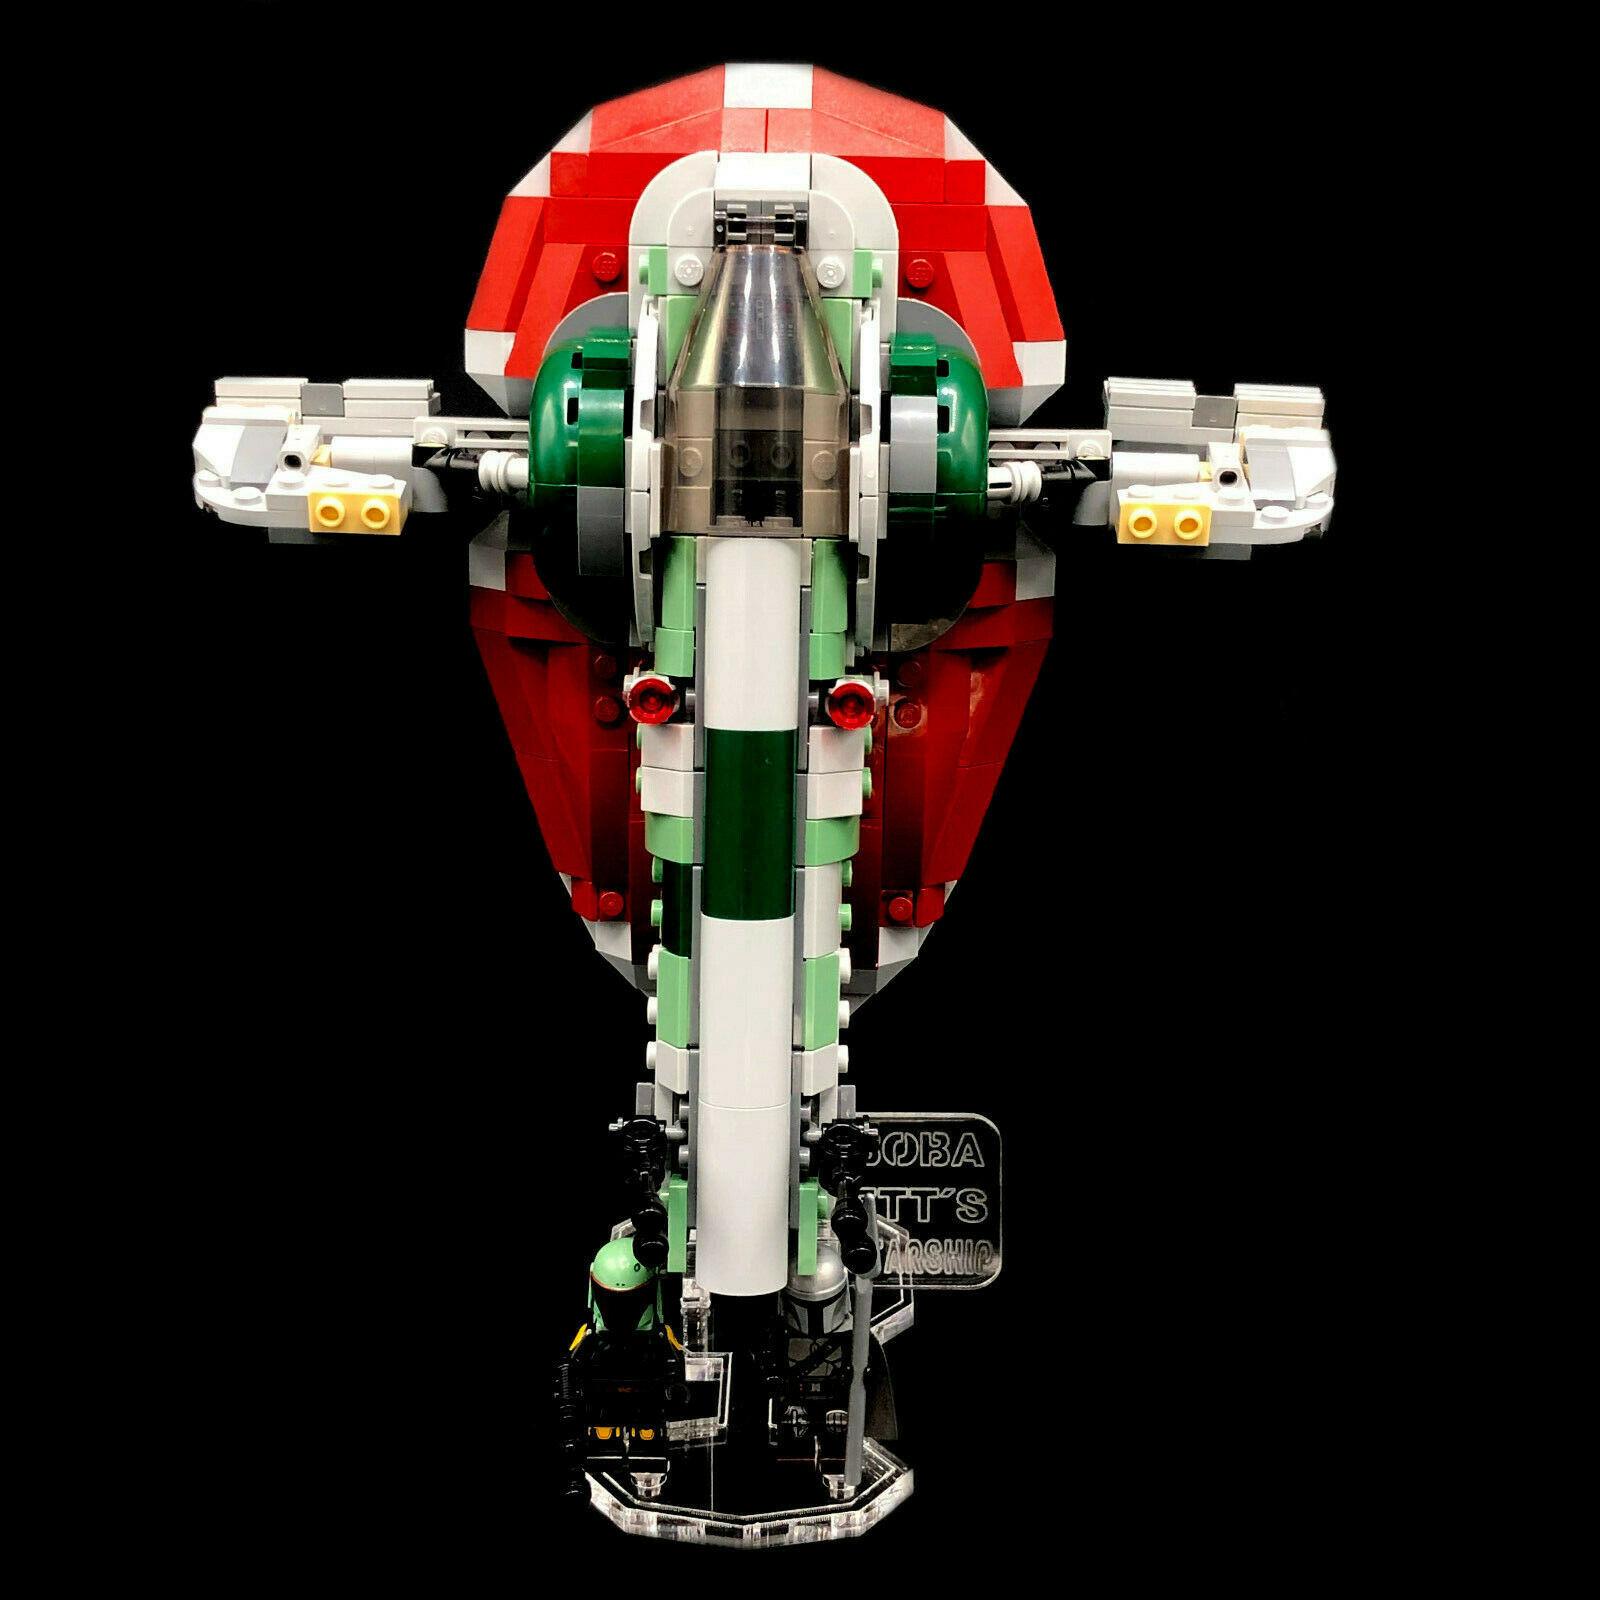 Acryl Deko Präsentation Standfuss LEGO Modell 75312 Boba Fetts Starship